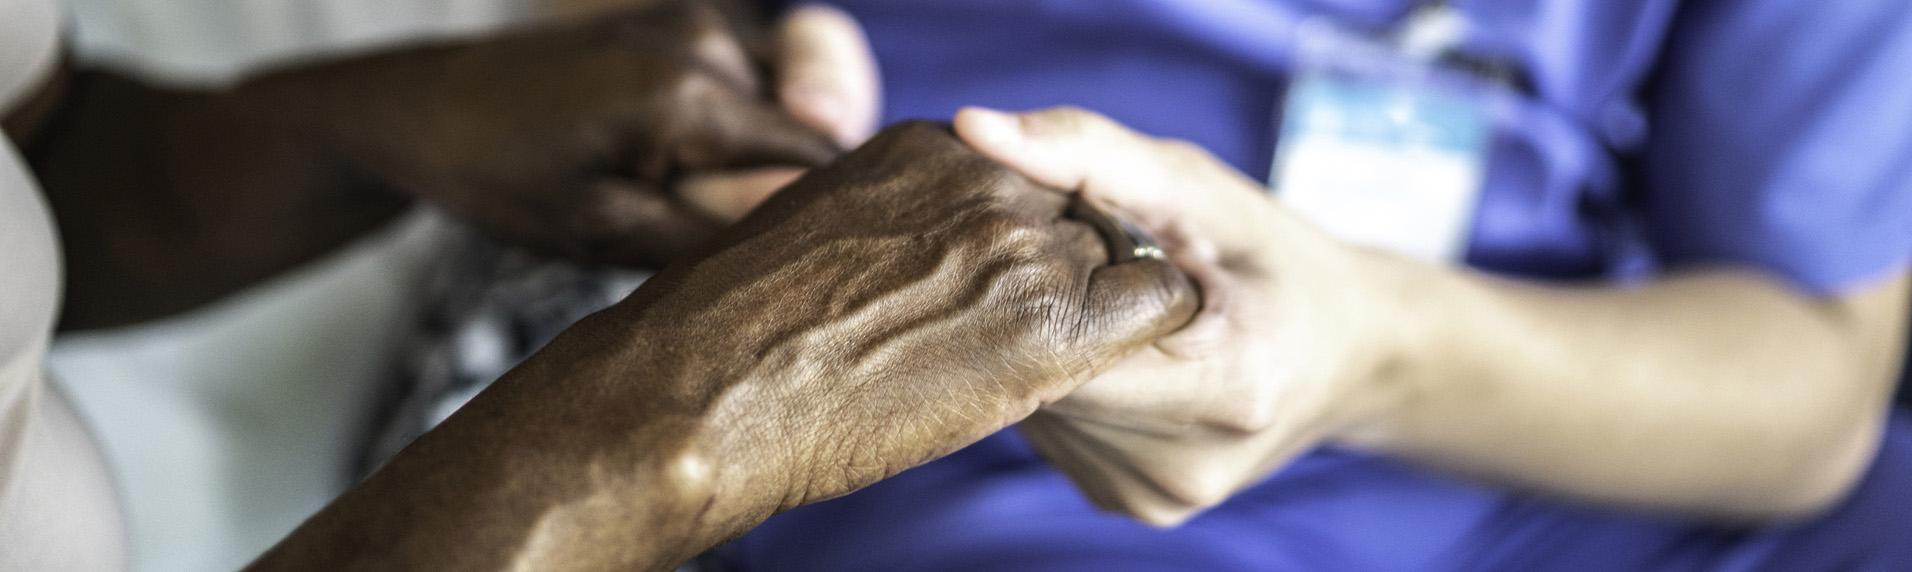 Nursing or retirement home caretaker holding hands with patient